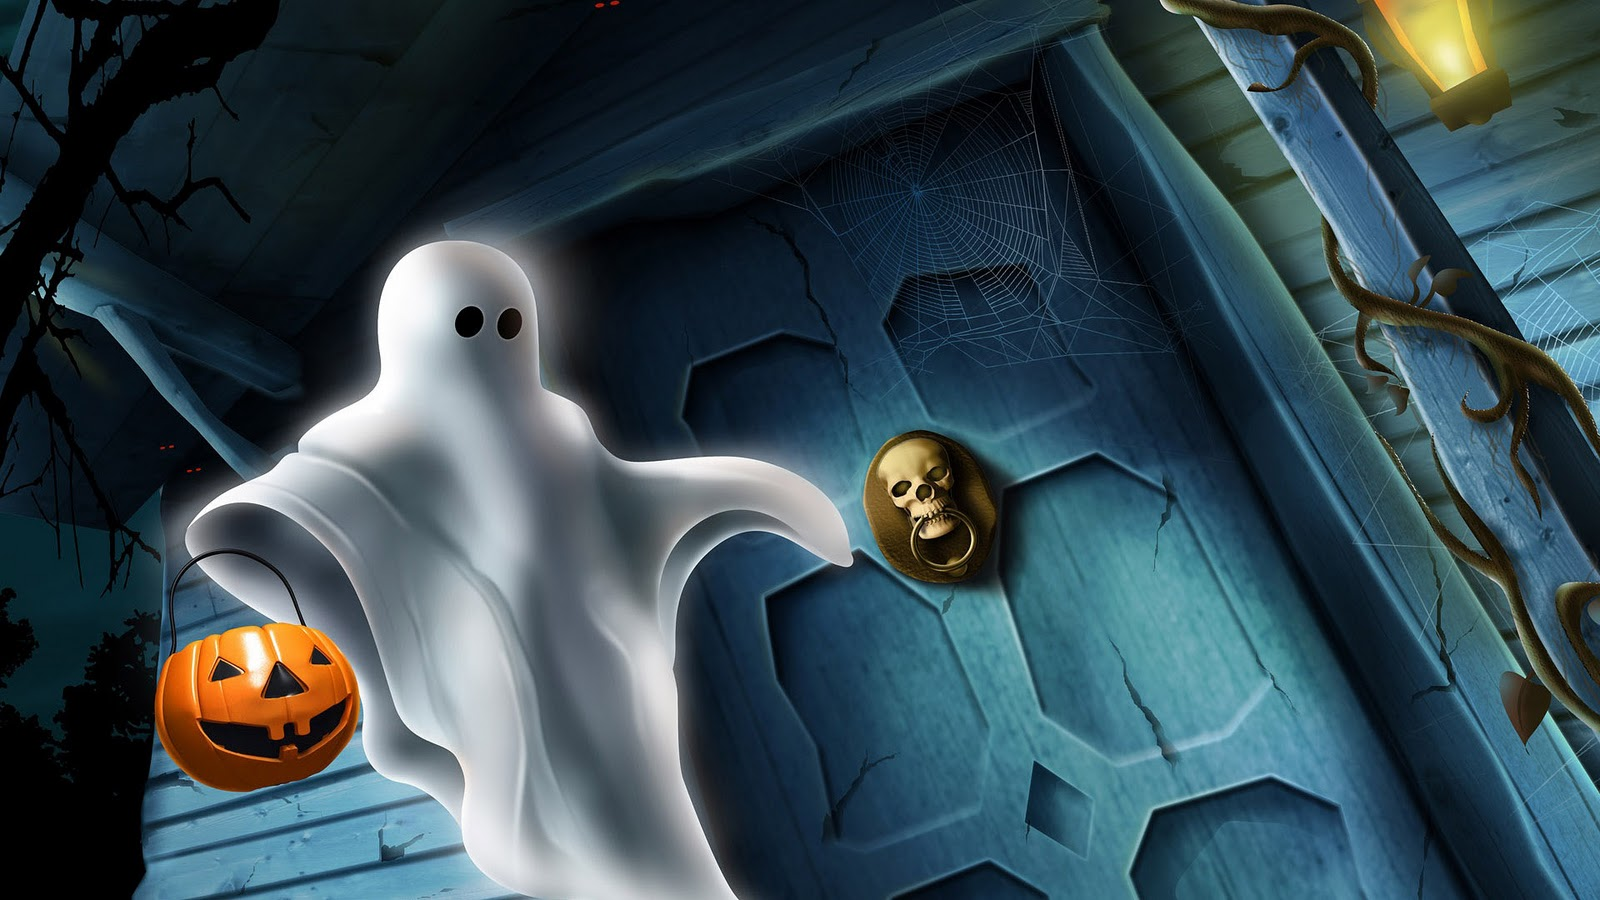 3d Live Wallpaper For Pc Windows 7 Free Download Top 25 Halloween Desktop Wallpapers Asianz Club